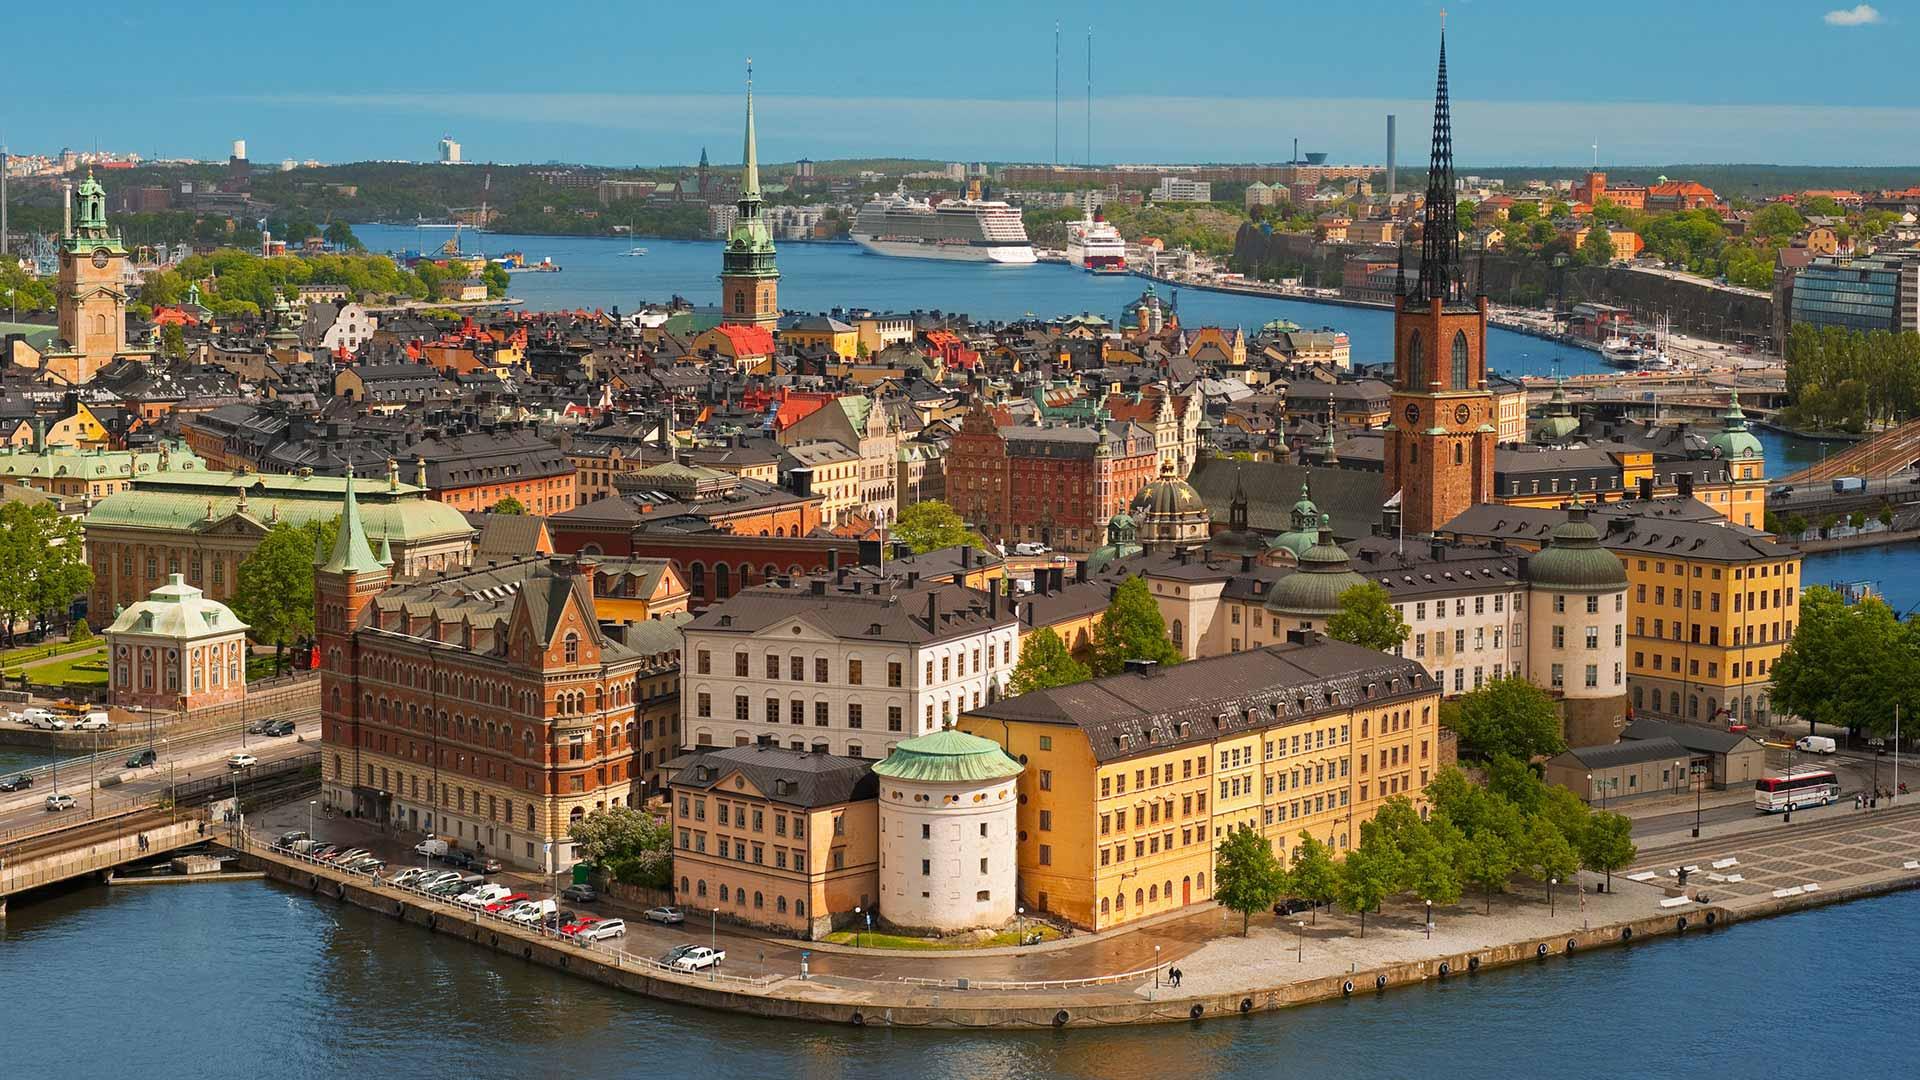 Fall 2020 Re-Planting of Gothenburg, Sweden